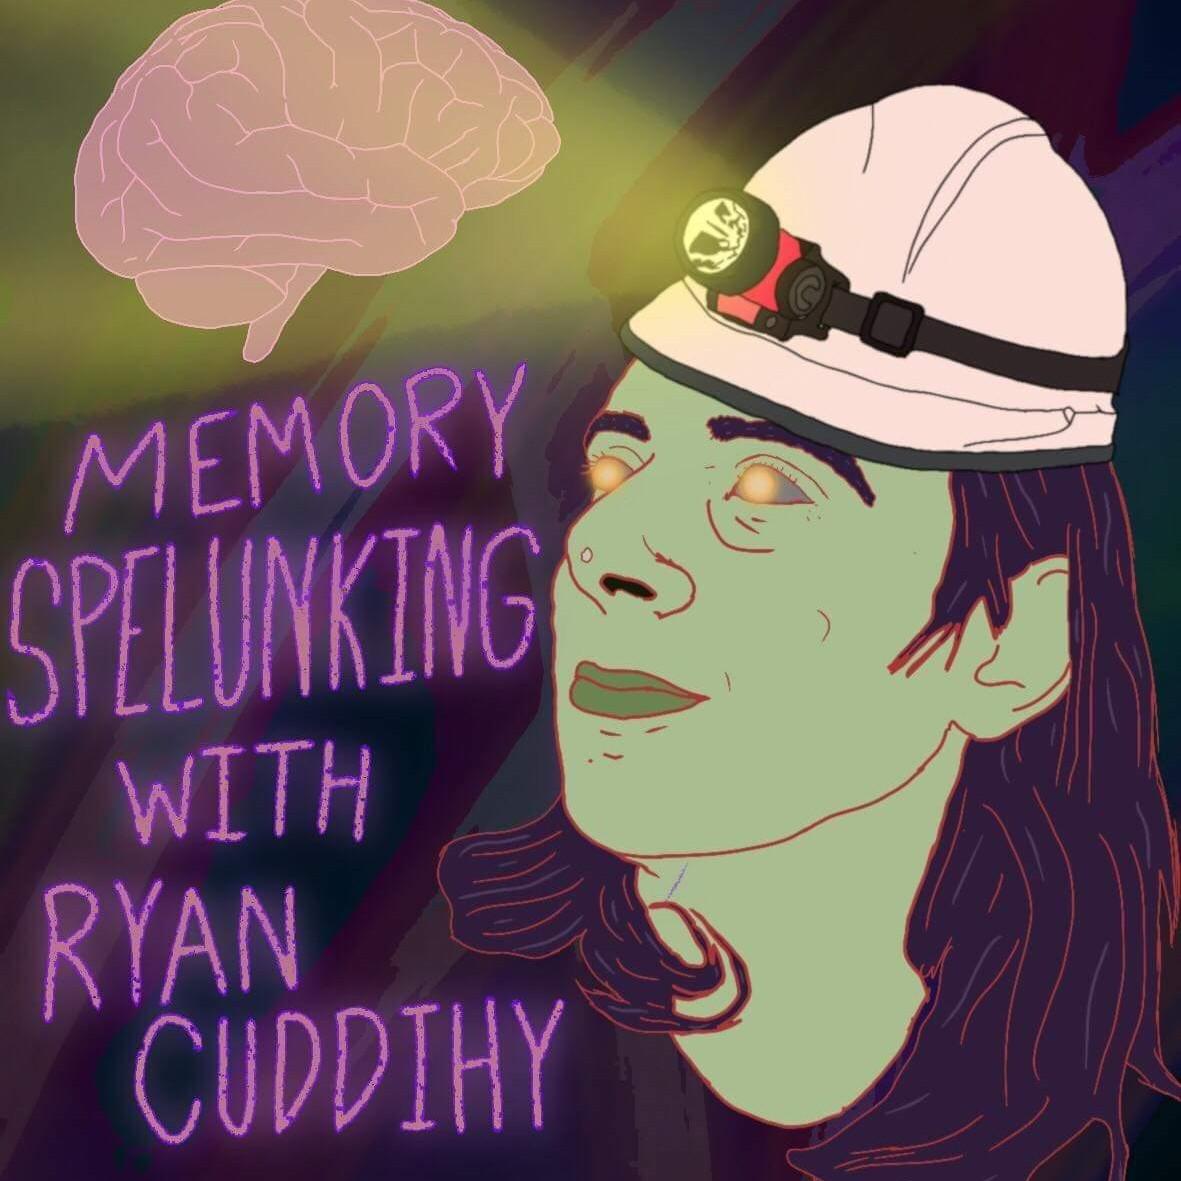 """David Letterman Eaten by Giraffe"" Memory Spelunking with Ryan Cuddihy"